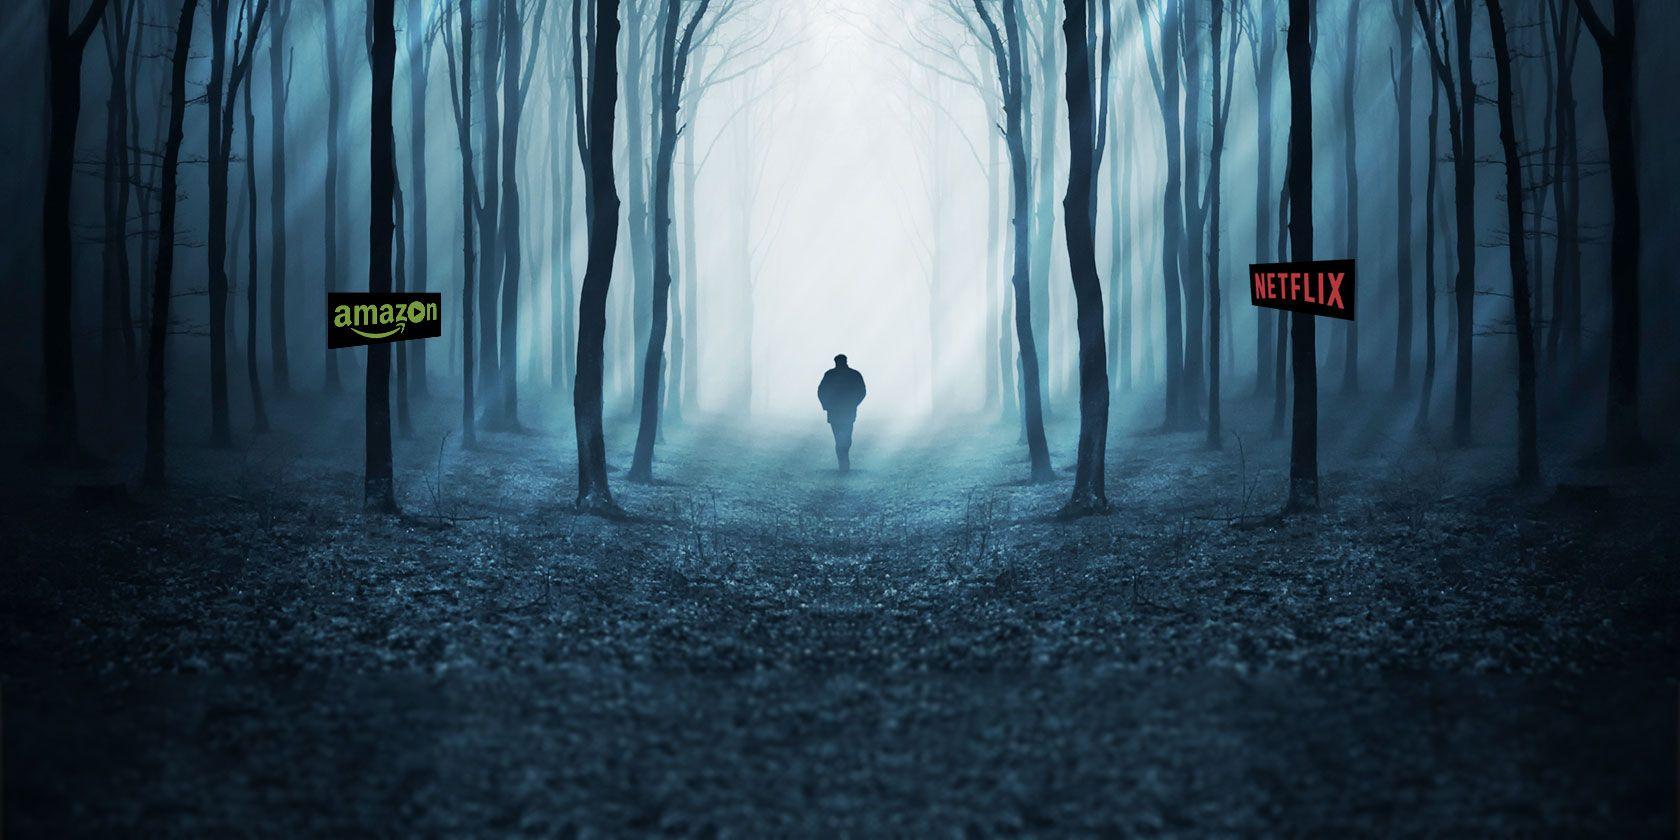 nordic-drammi-amazon-Netflix